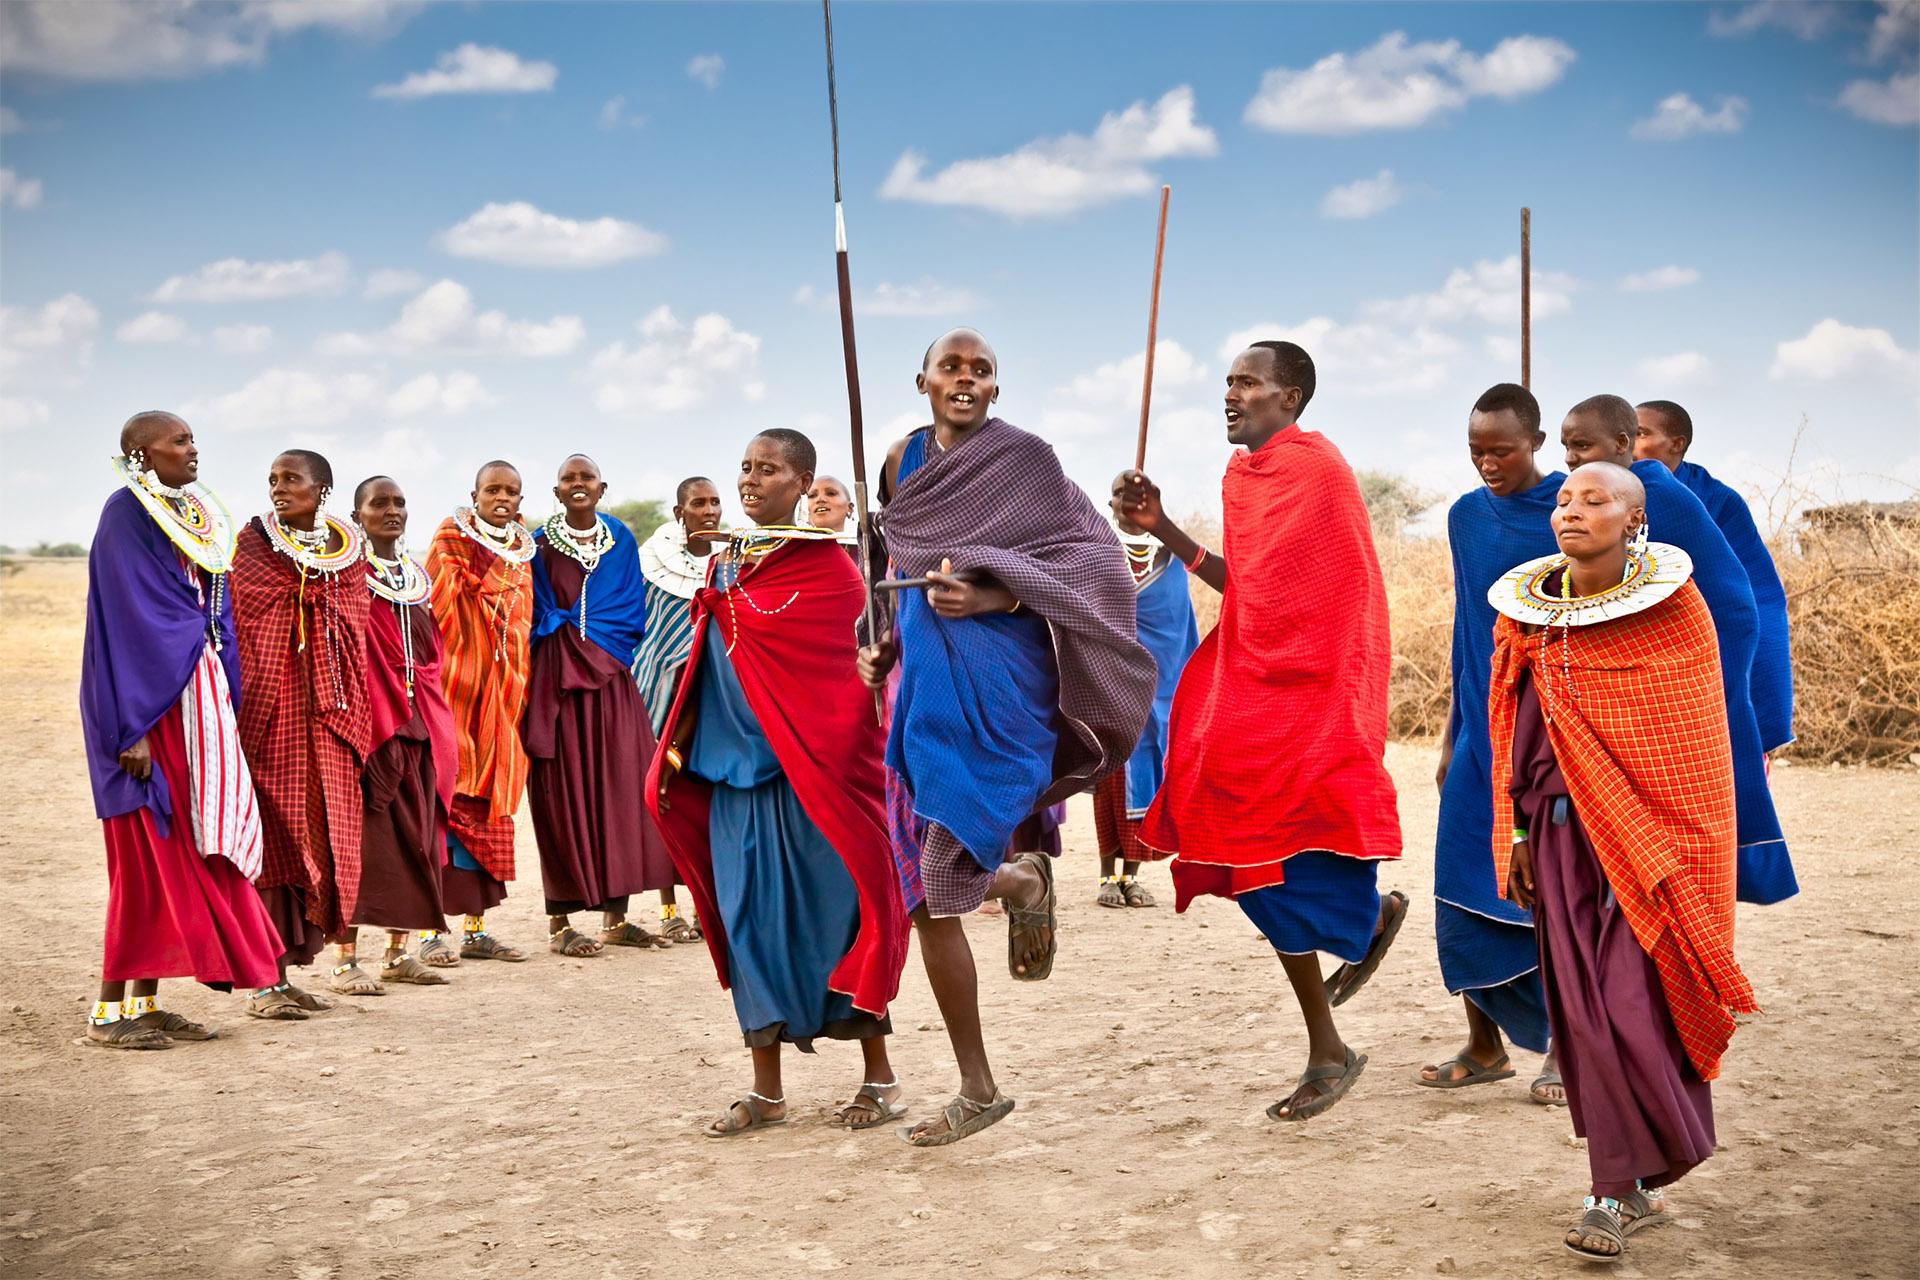 TANZANIA, AFRICA FEBRUARY 9, 2014: Masai Warriors Dancing Tradi